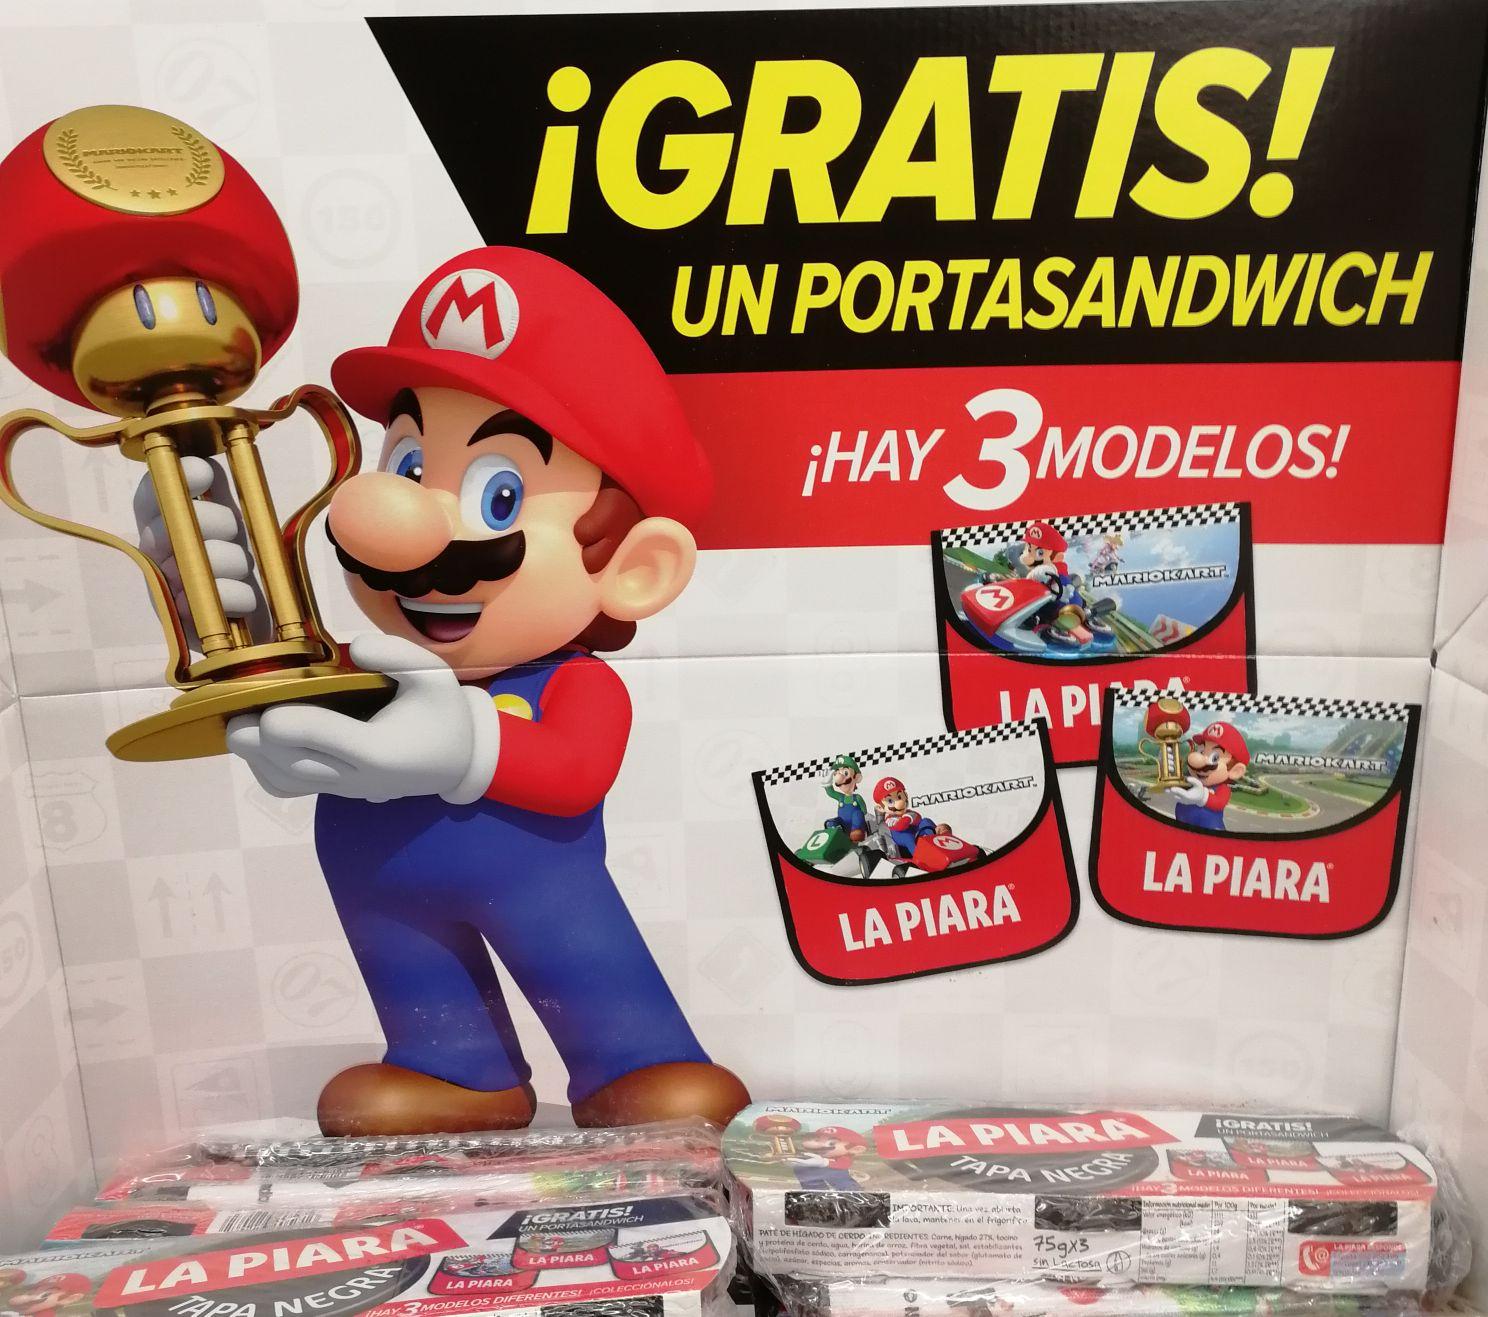 PortaSandwich de MarioKart [GRATIS] comprando 3 latas de LaPiara